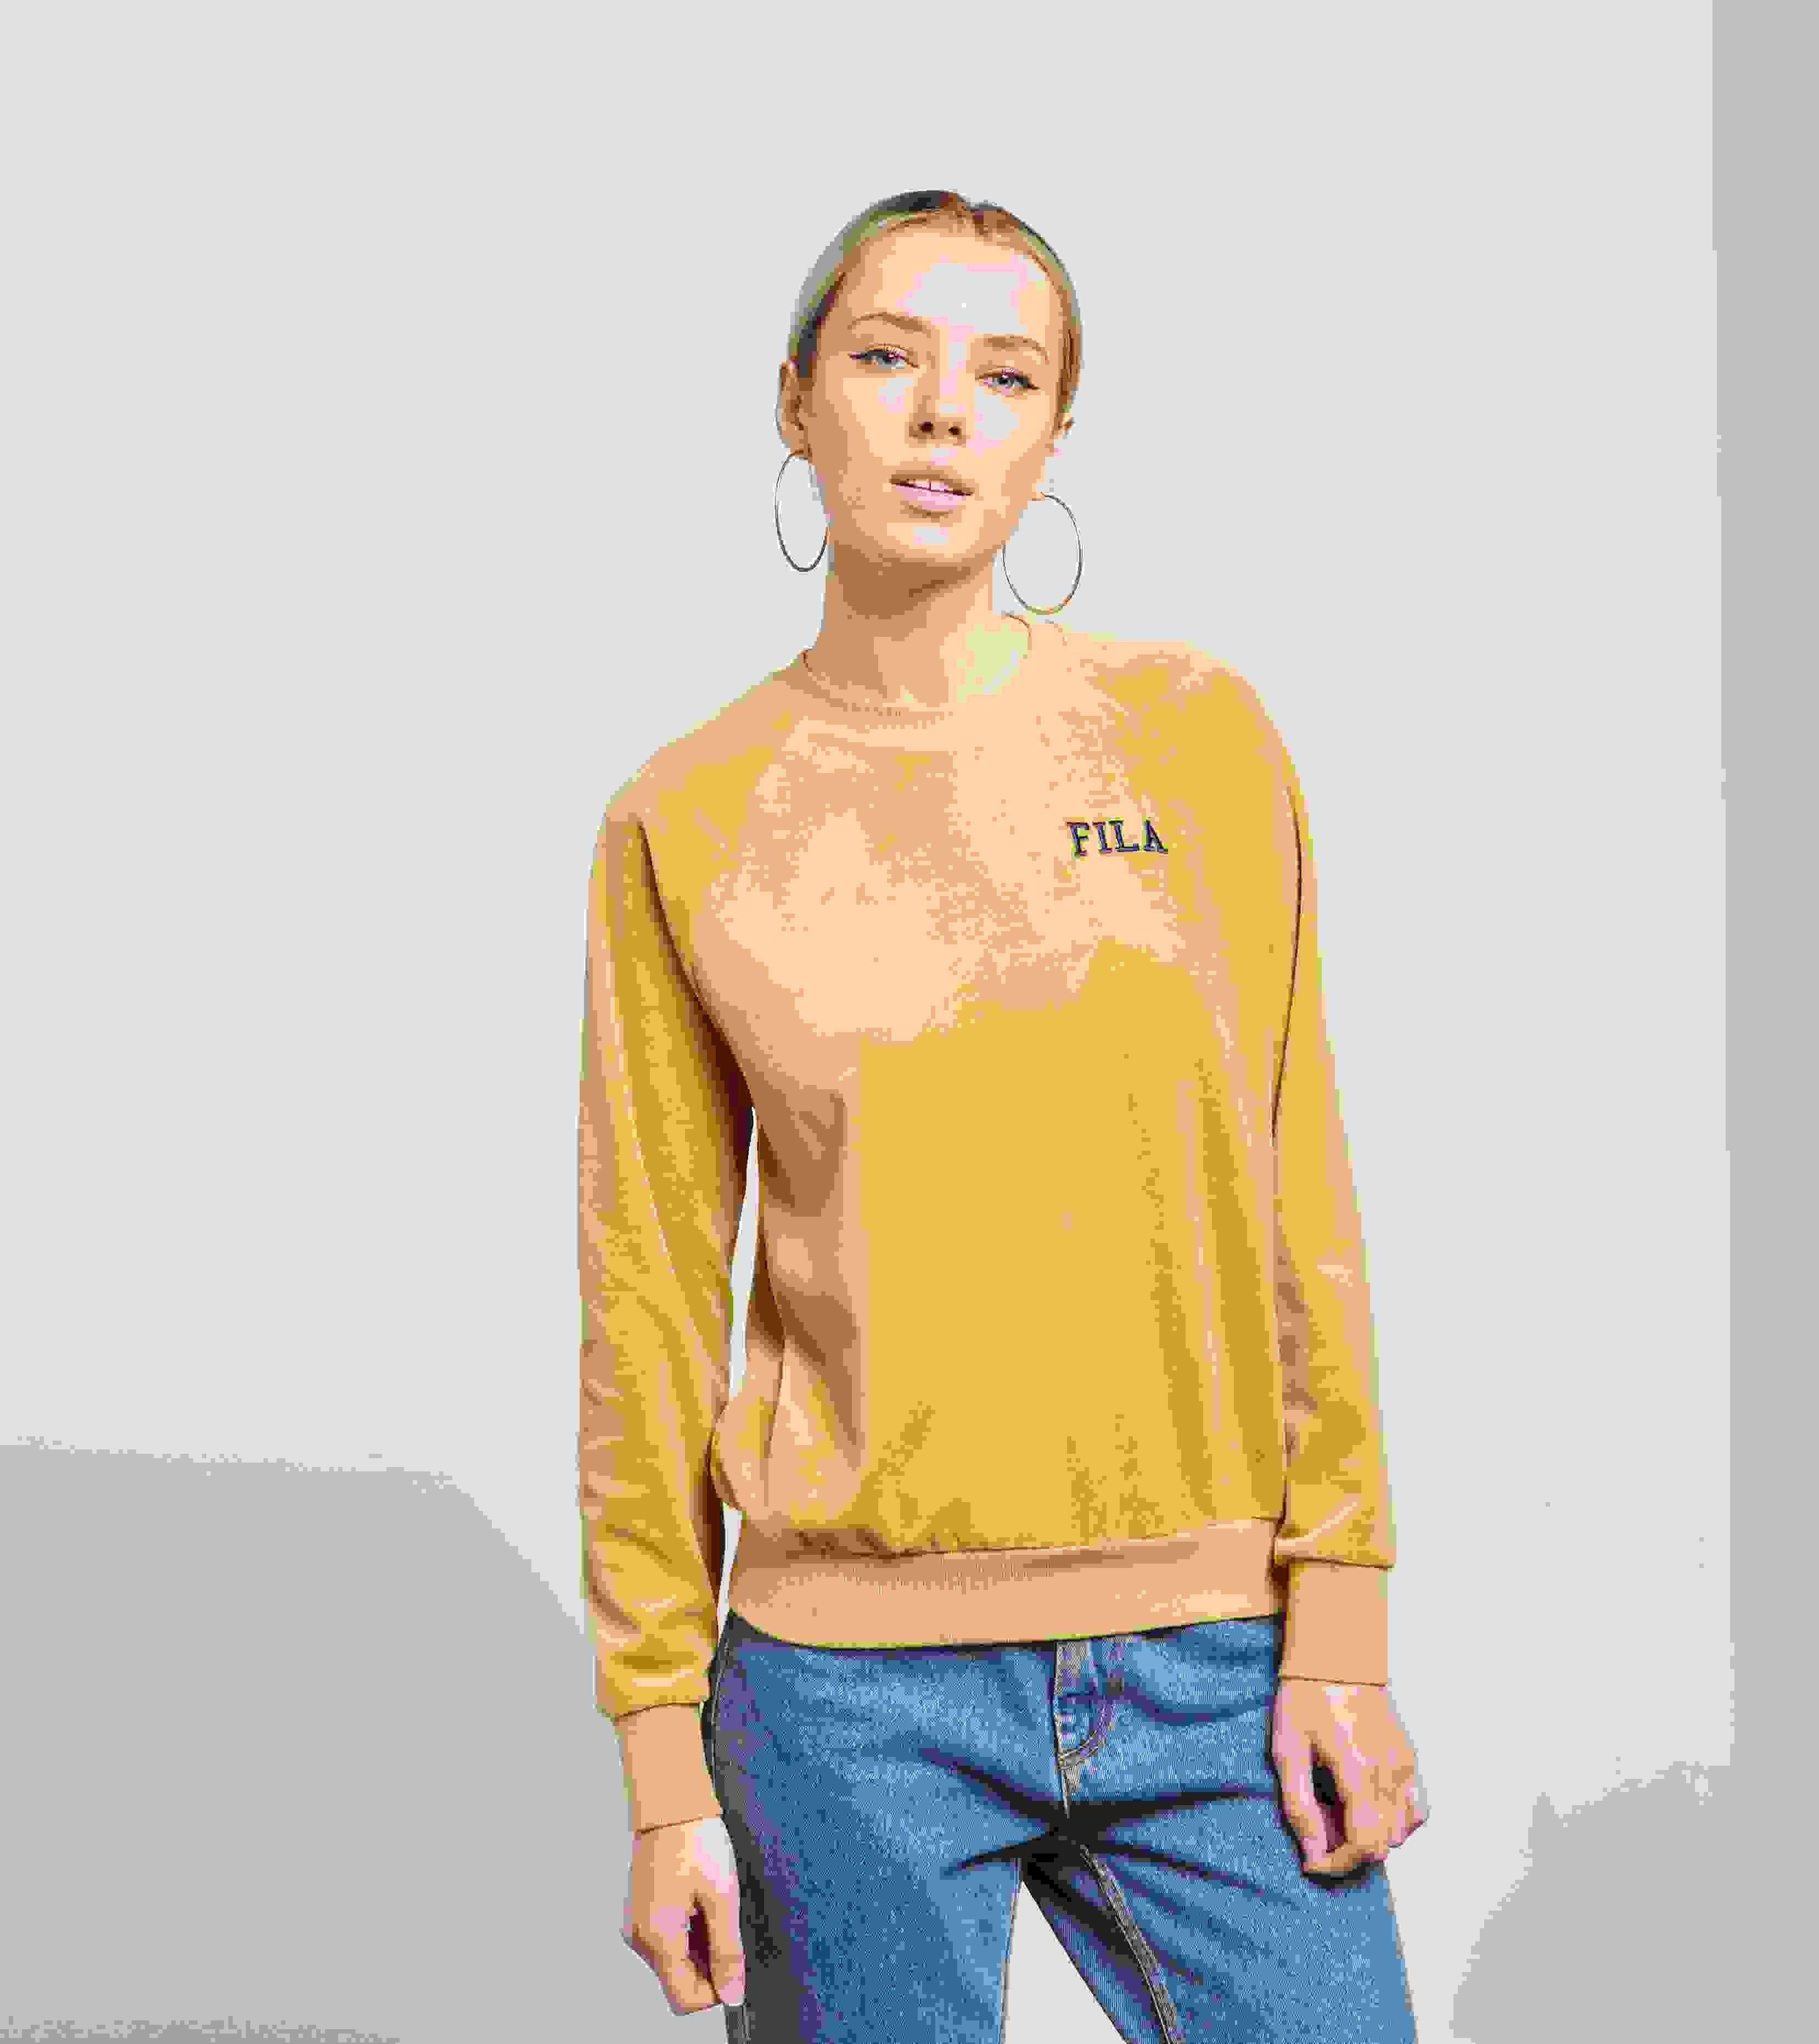 fila yellow top. fila cyndi logo sweatshirt yellow top a